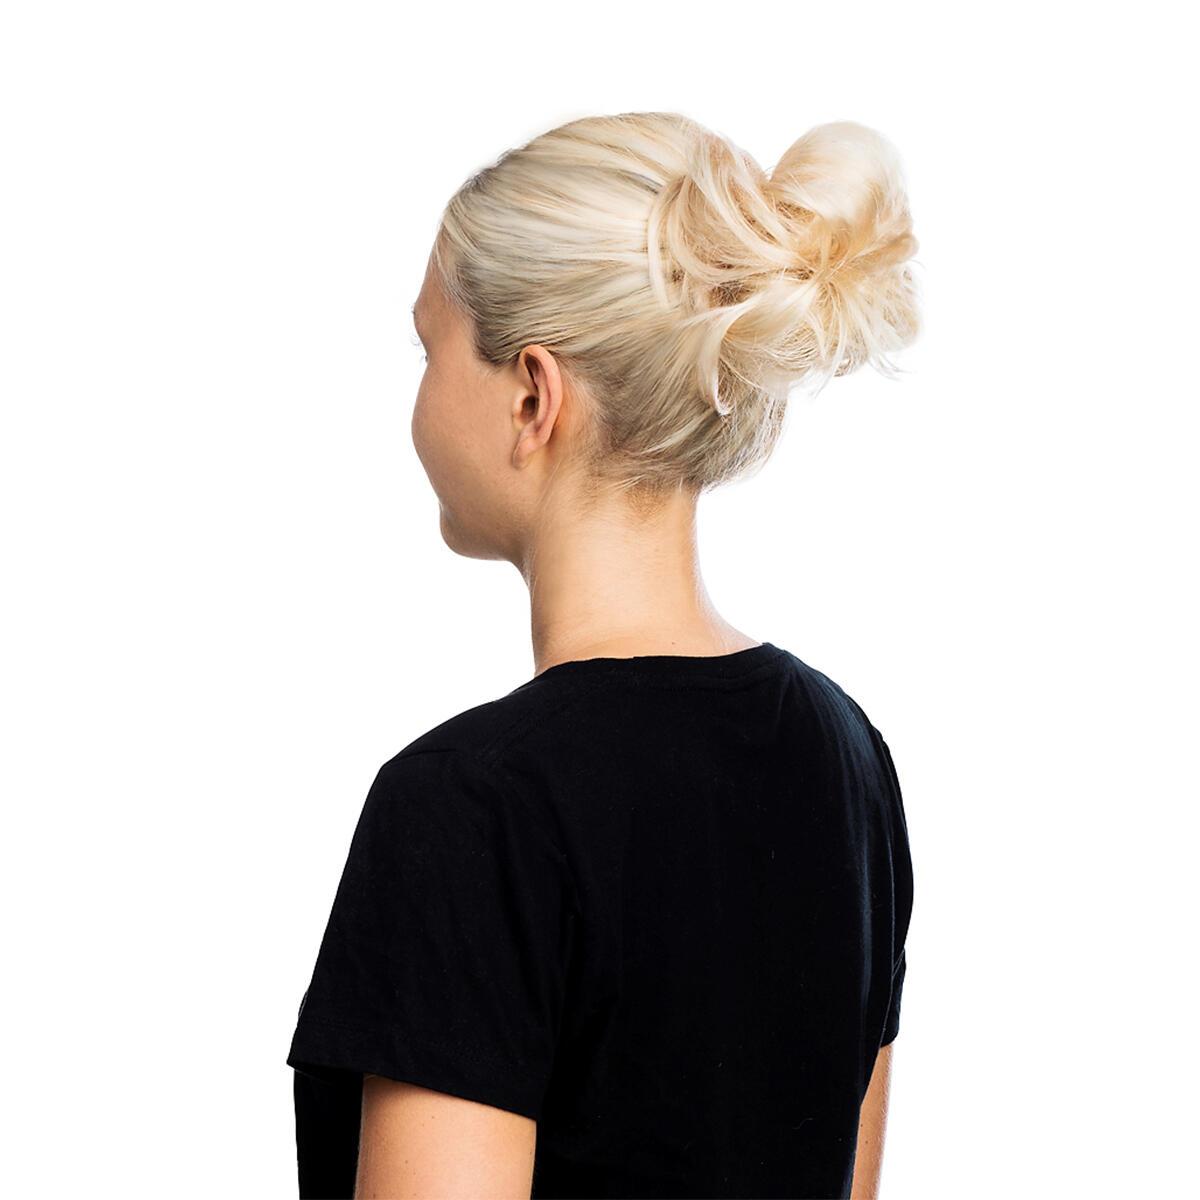 Volume Hair Scrunchie 40 G Scrunchie with real hair 7.3 Cendre Ash